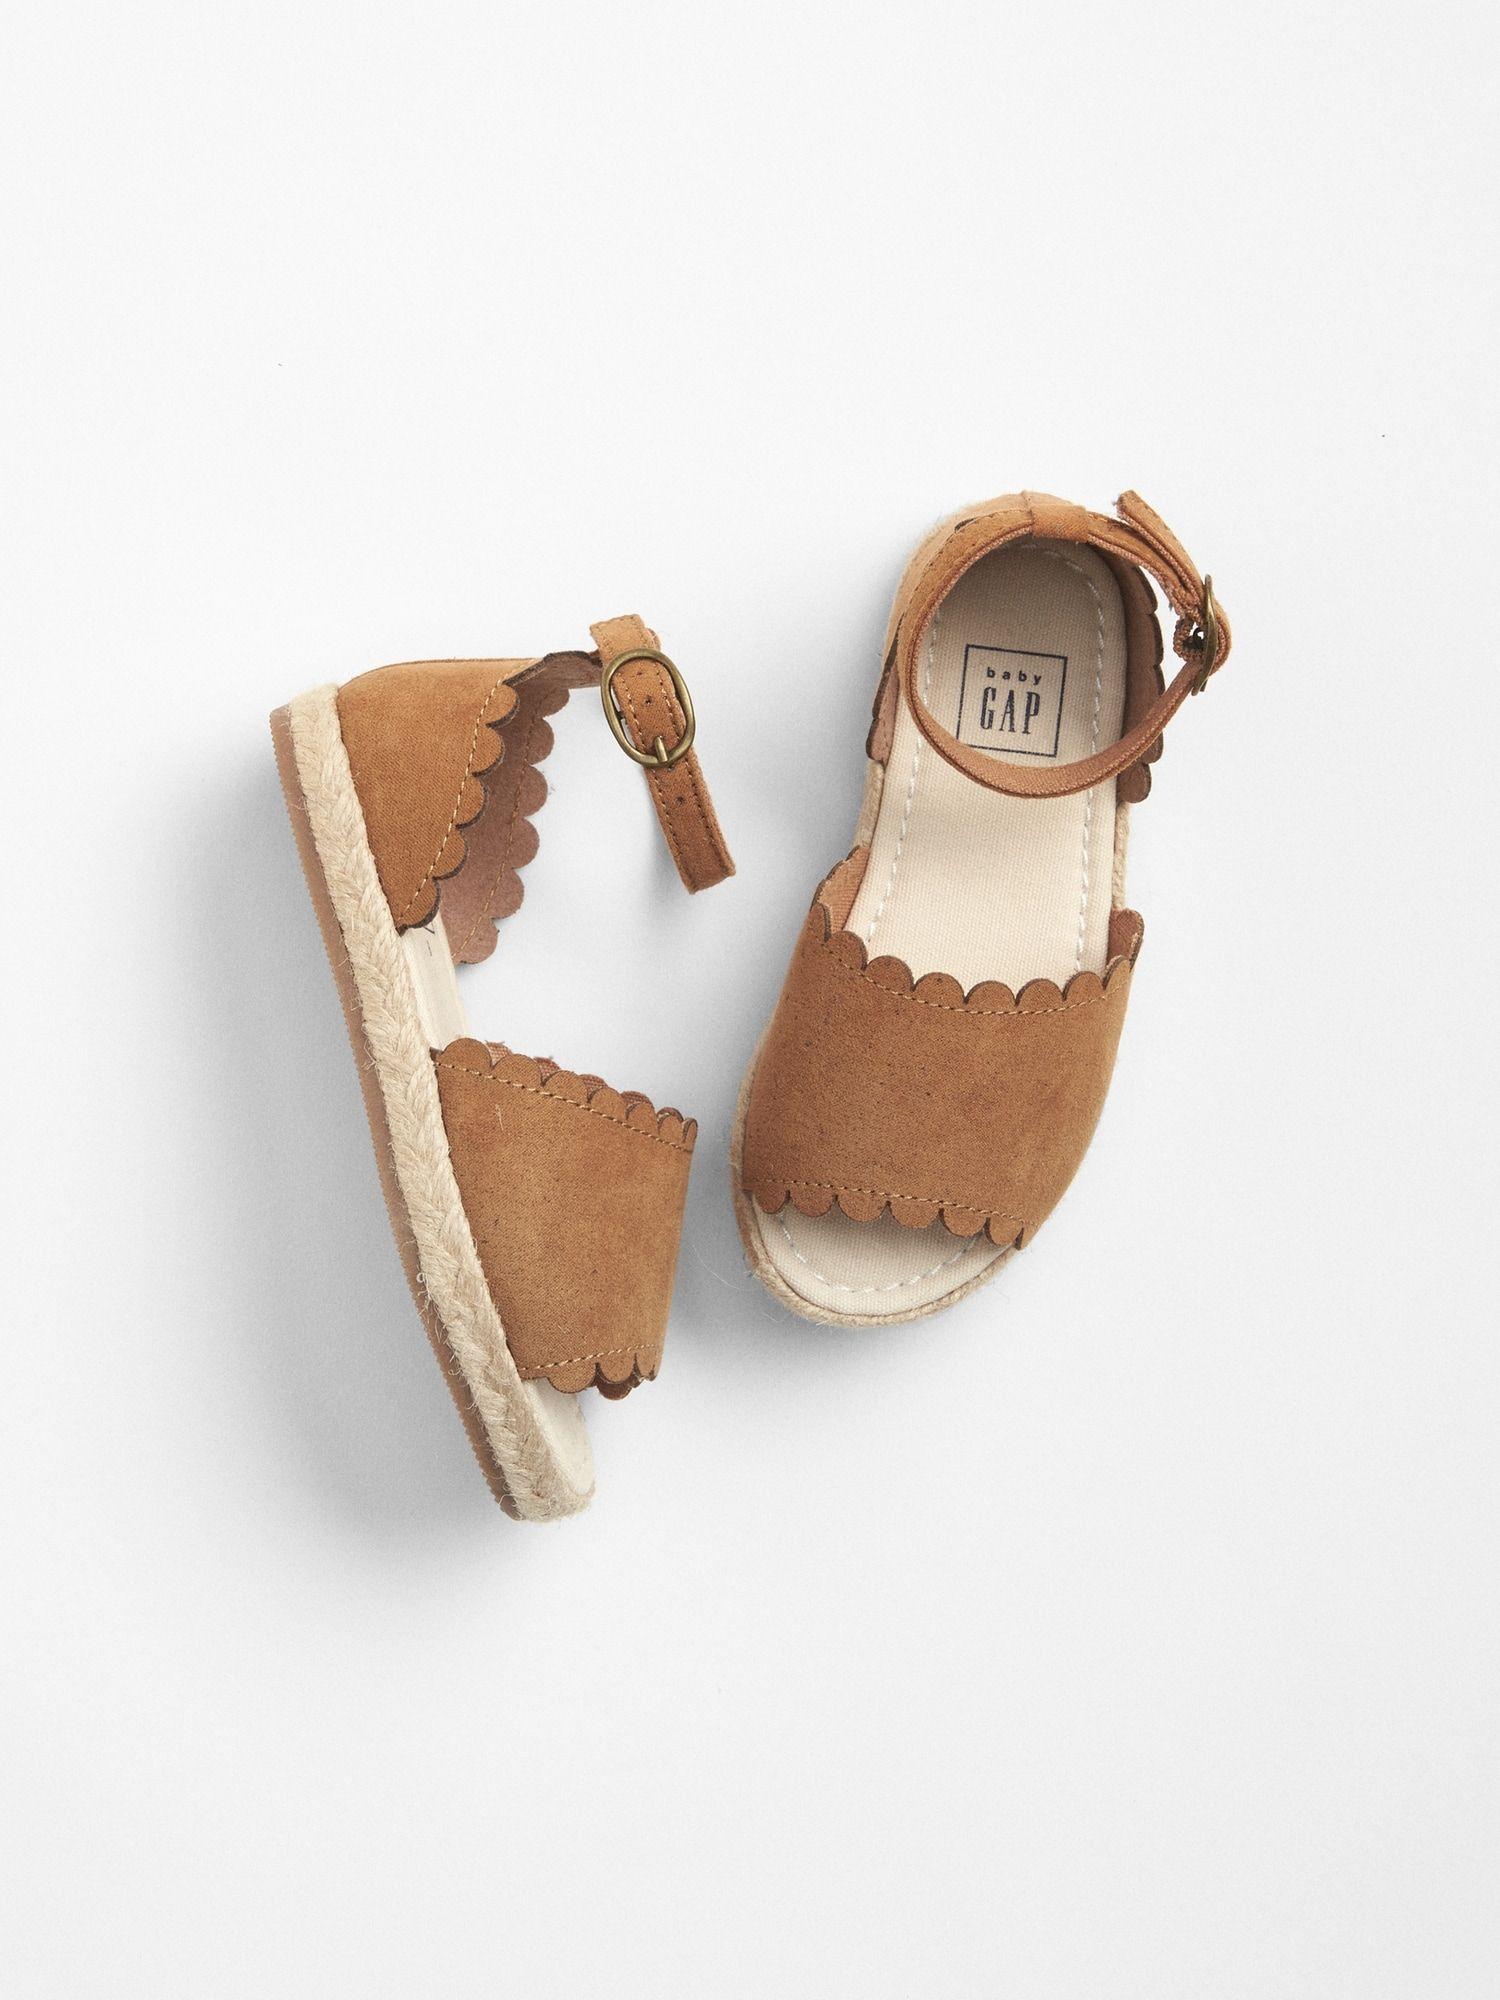 350c552544a183 Scalloped Espadrille Sandals | Gap | Girl fashion | Toddler sandals ...